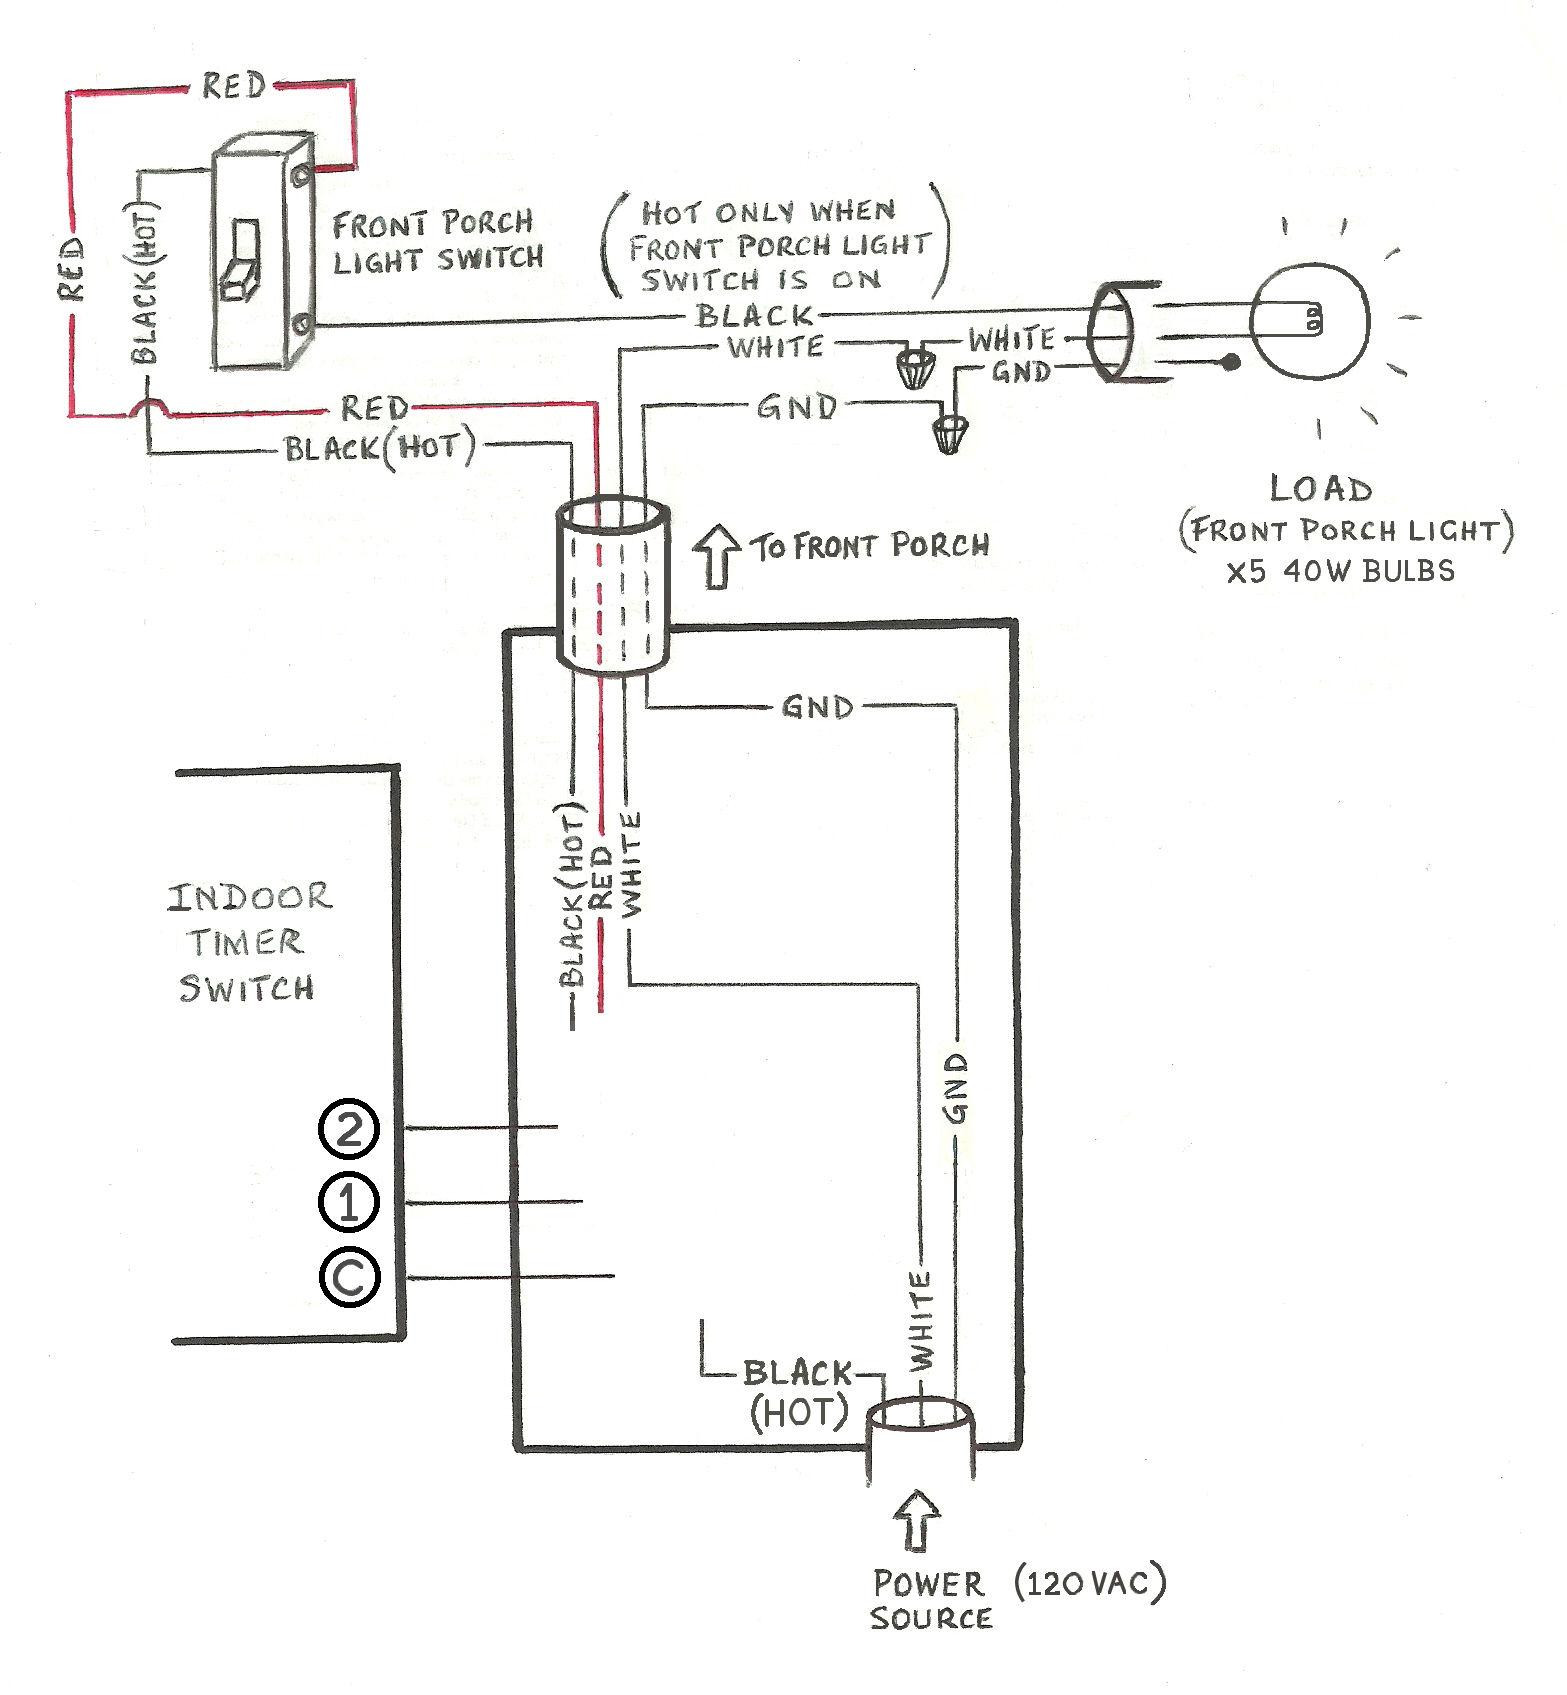 Peachy Need Help Wiring A 3 Way Honeywell Digital Timer Switch Home Wiring Cloud Genionhyedimohammedshrineorg